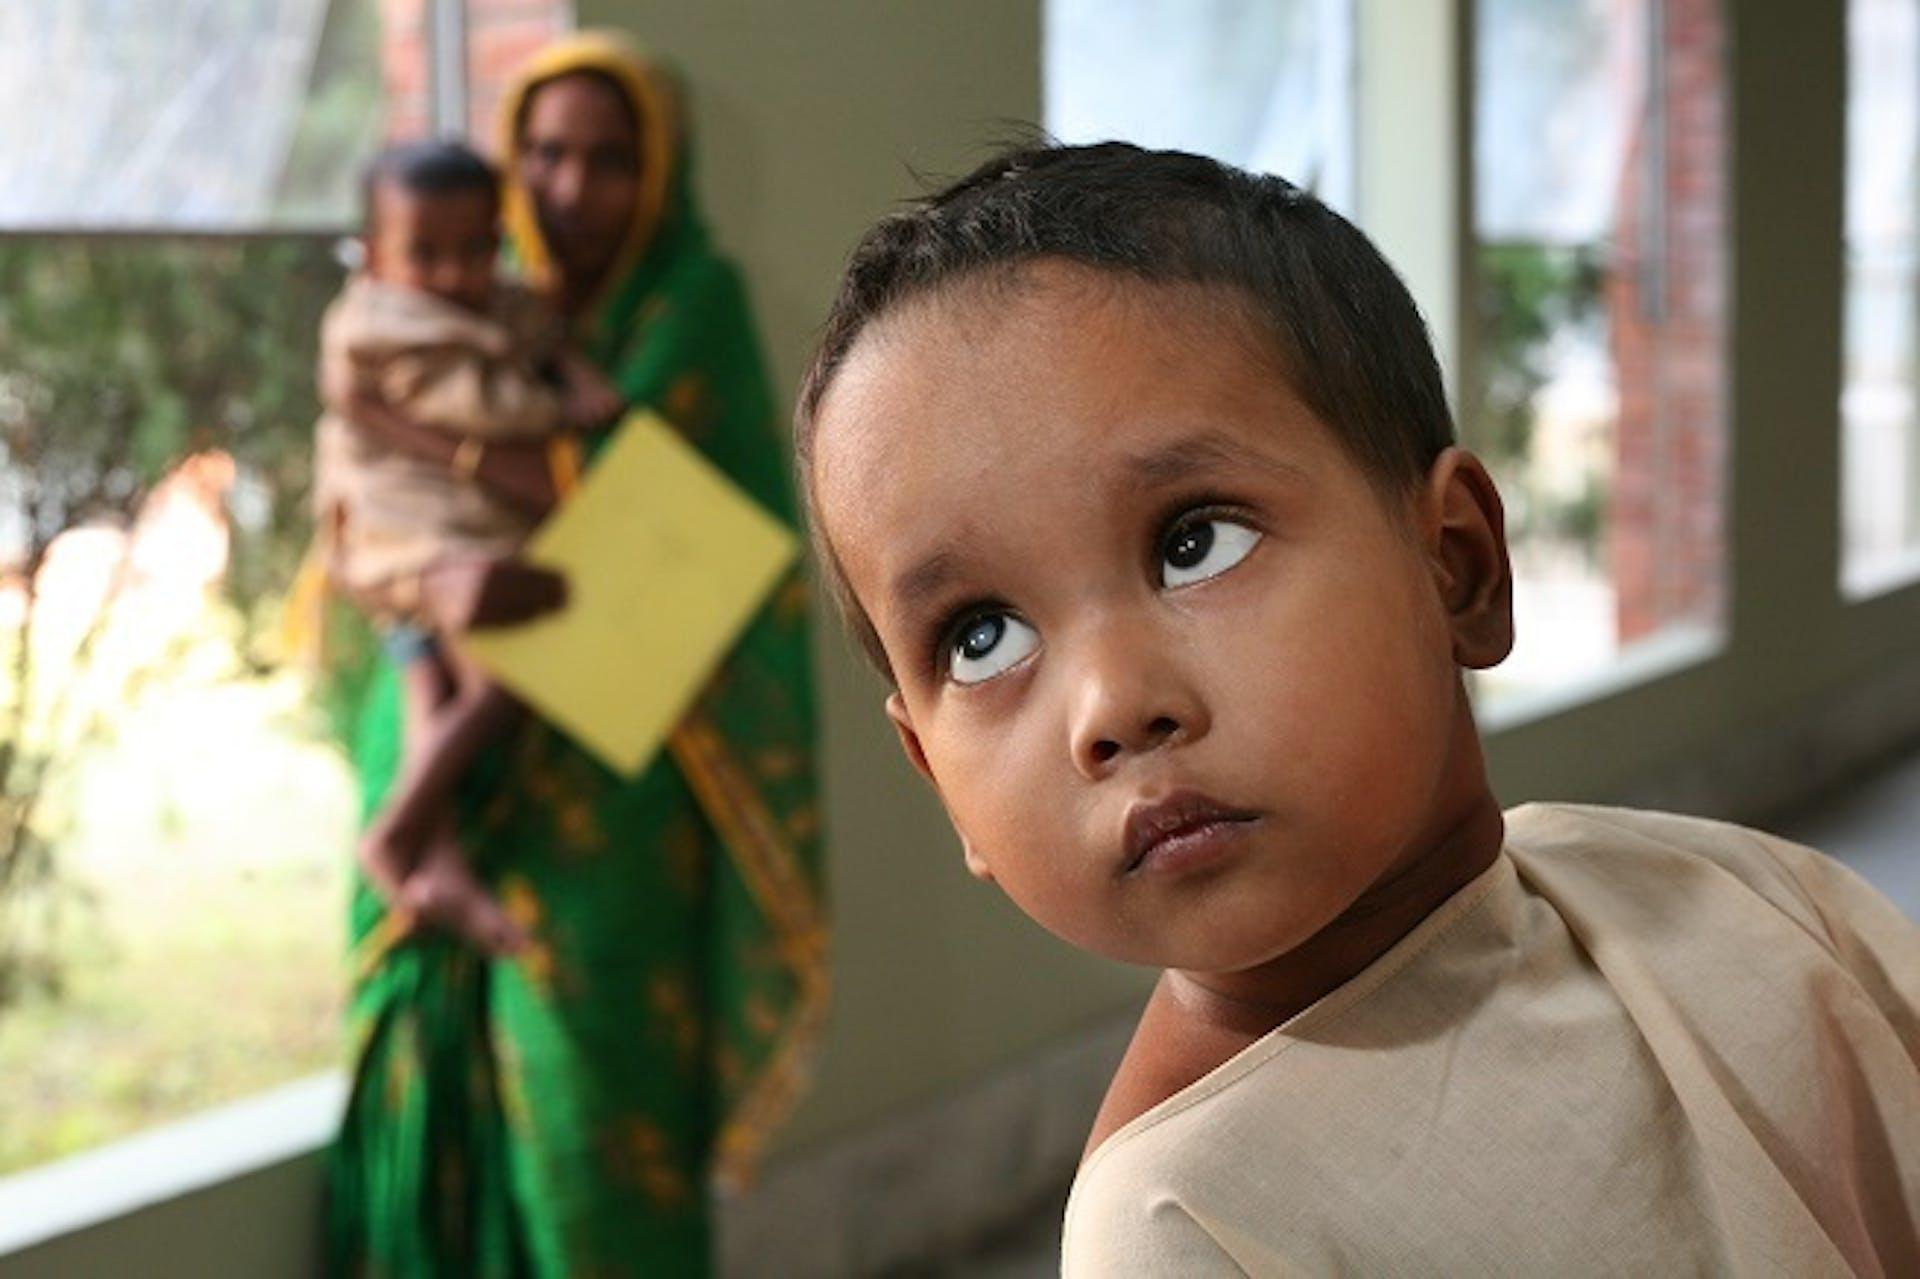 Paediatric cataract patient Halima from Bangladesh